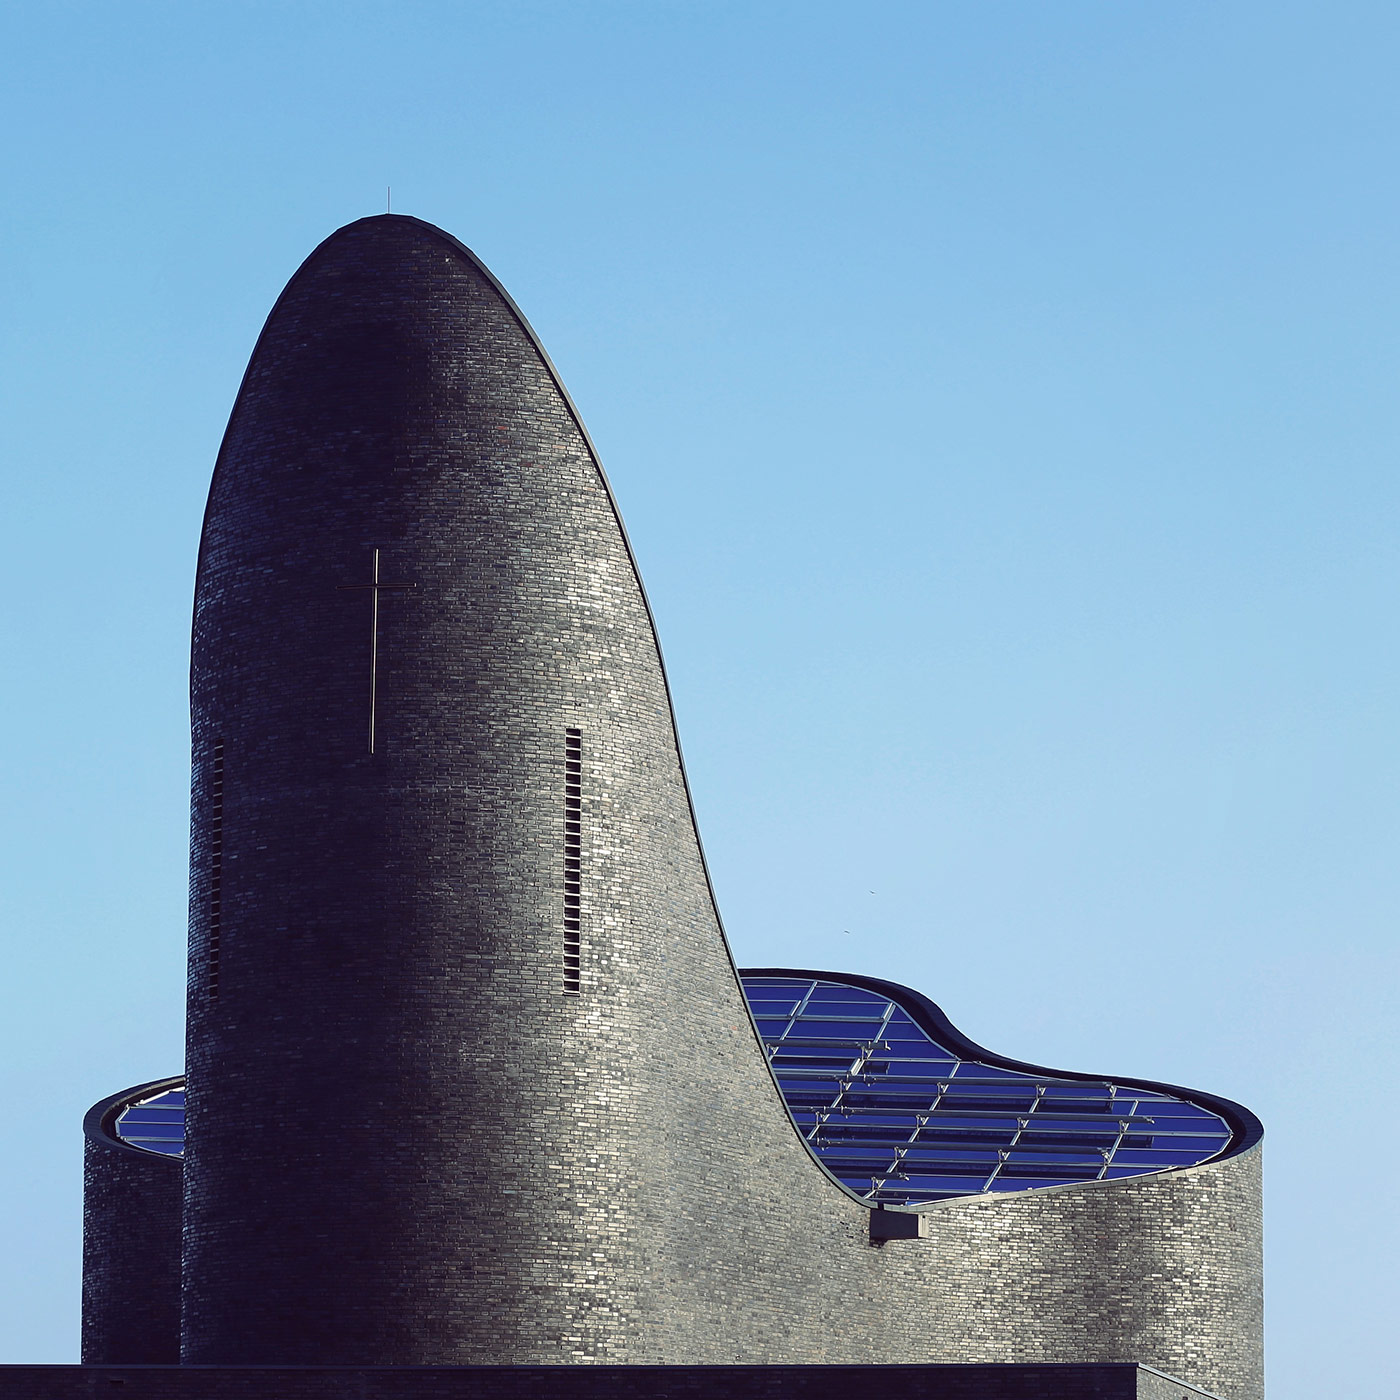 Church St. Marien Location: Schillig, Germany Architect: Königs Architekten